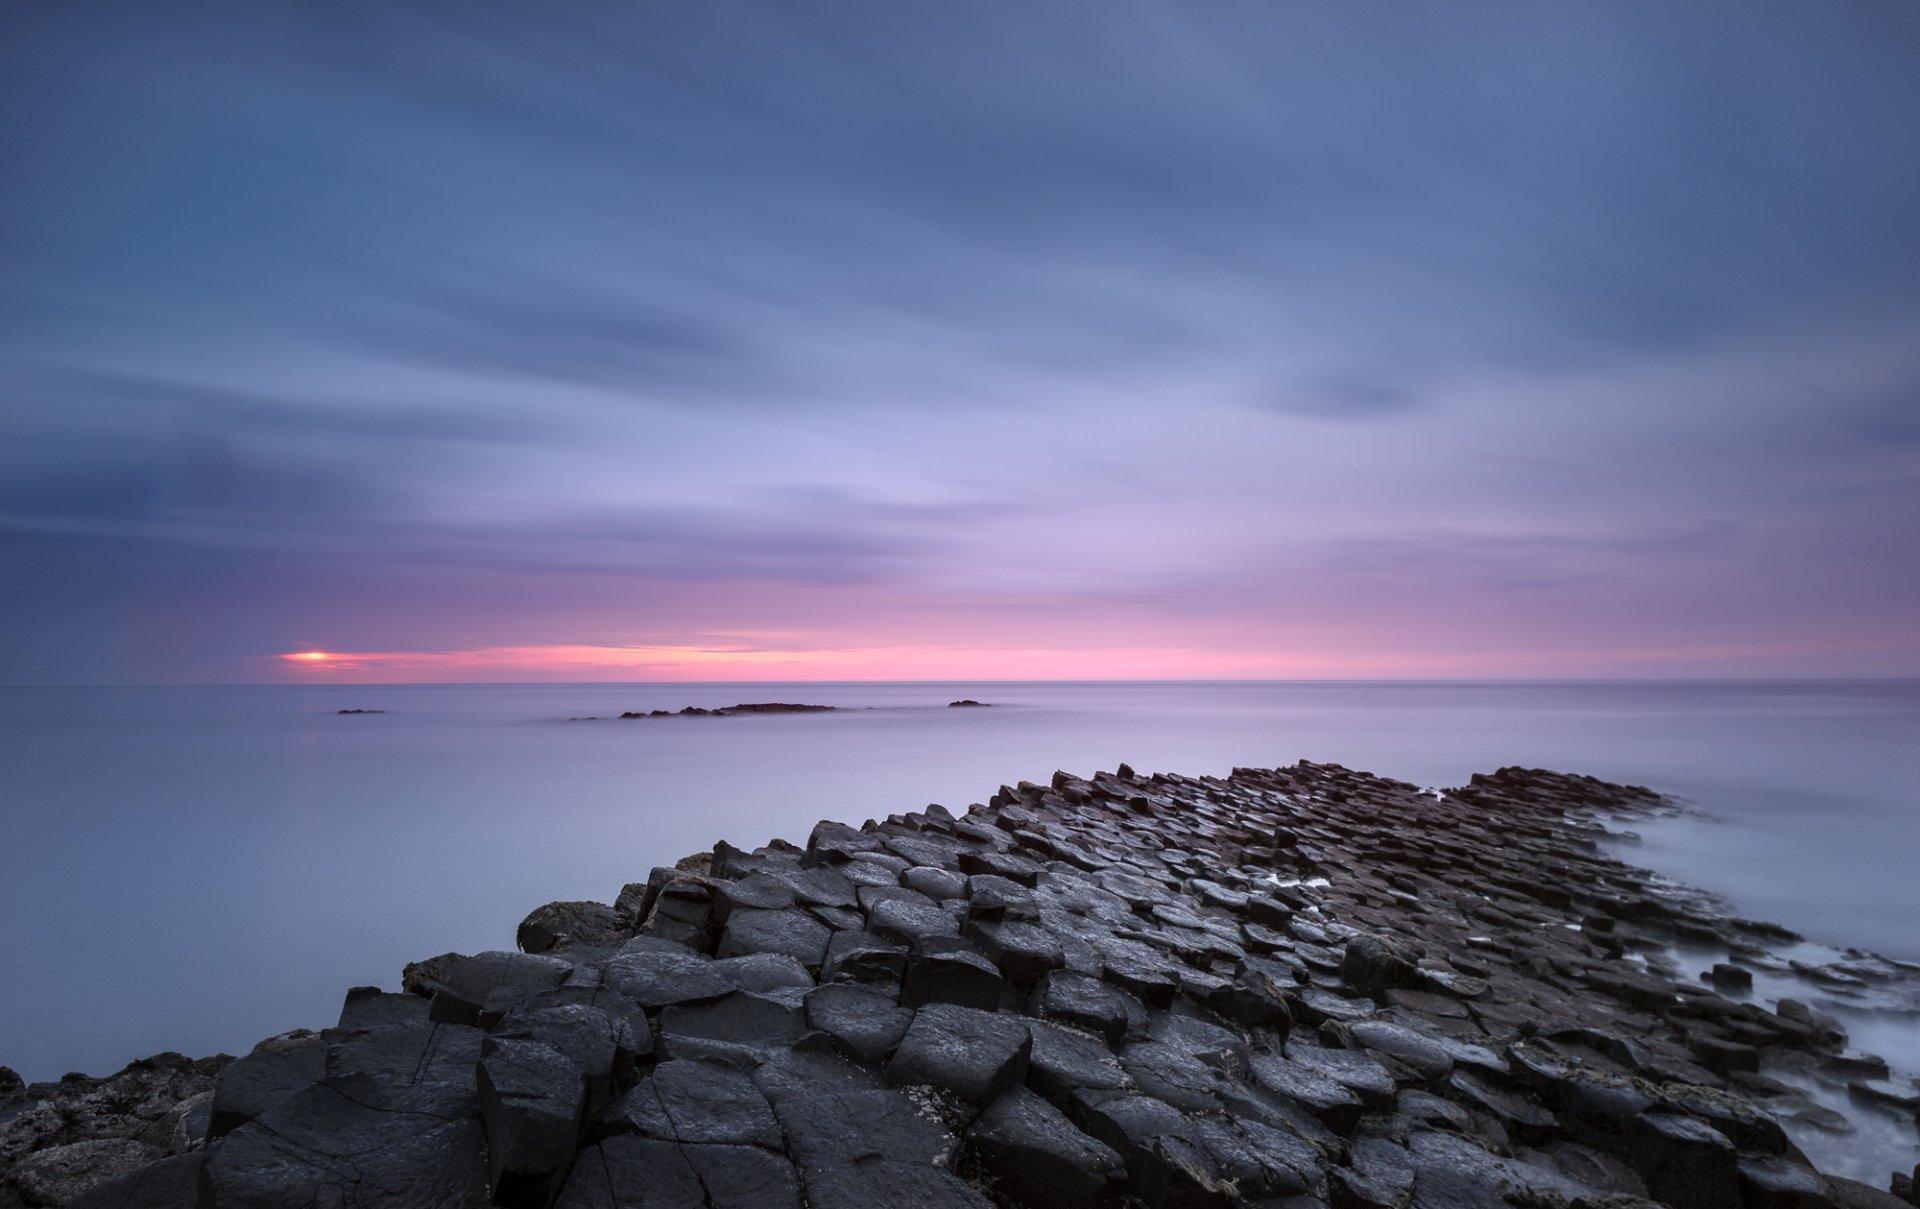 united kingdom northern ireland sea beach calm night pink 1920x1209